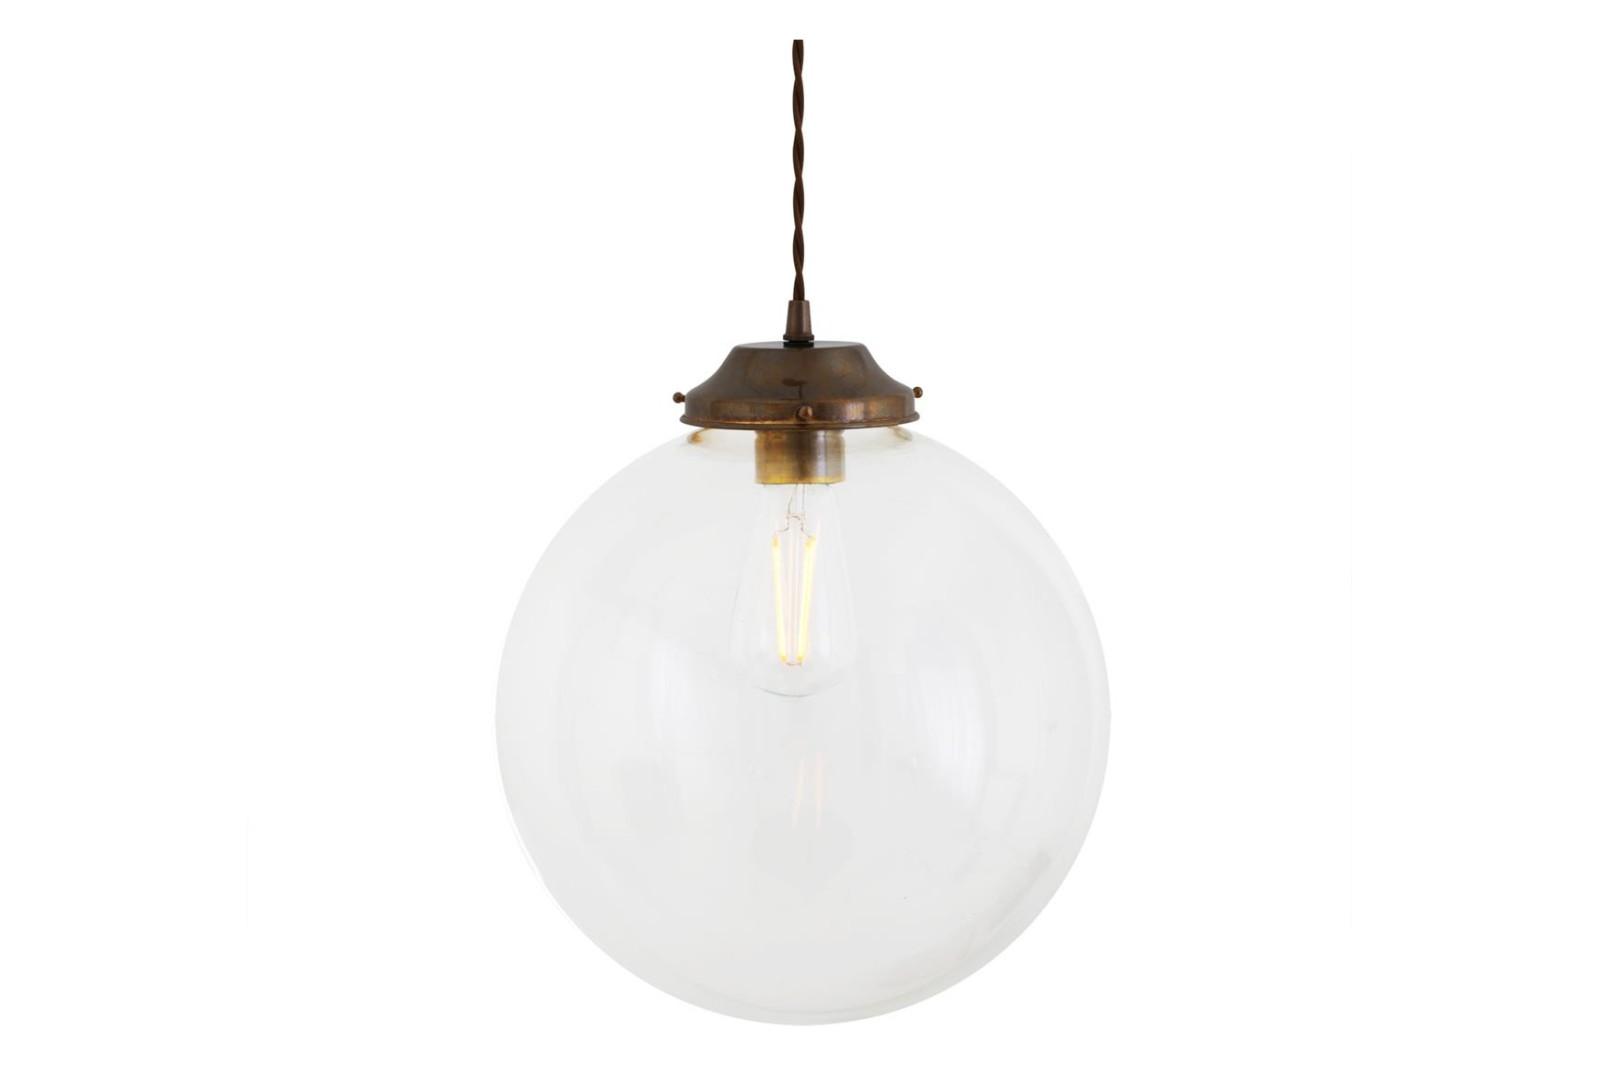 Virginia Clear Globe Pendant Light Antique Brass, 30cm